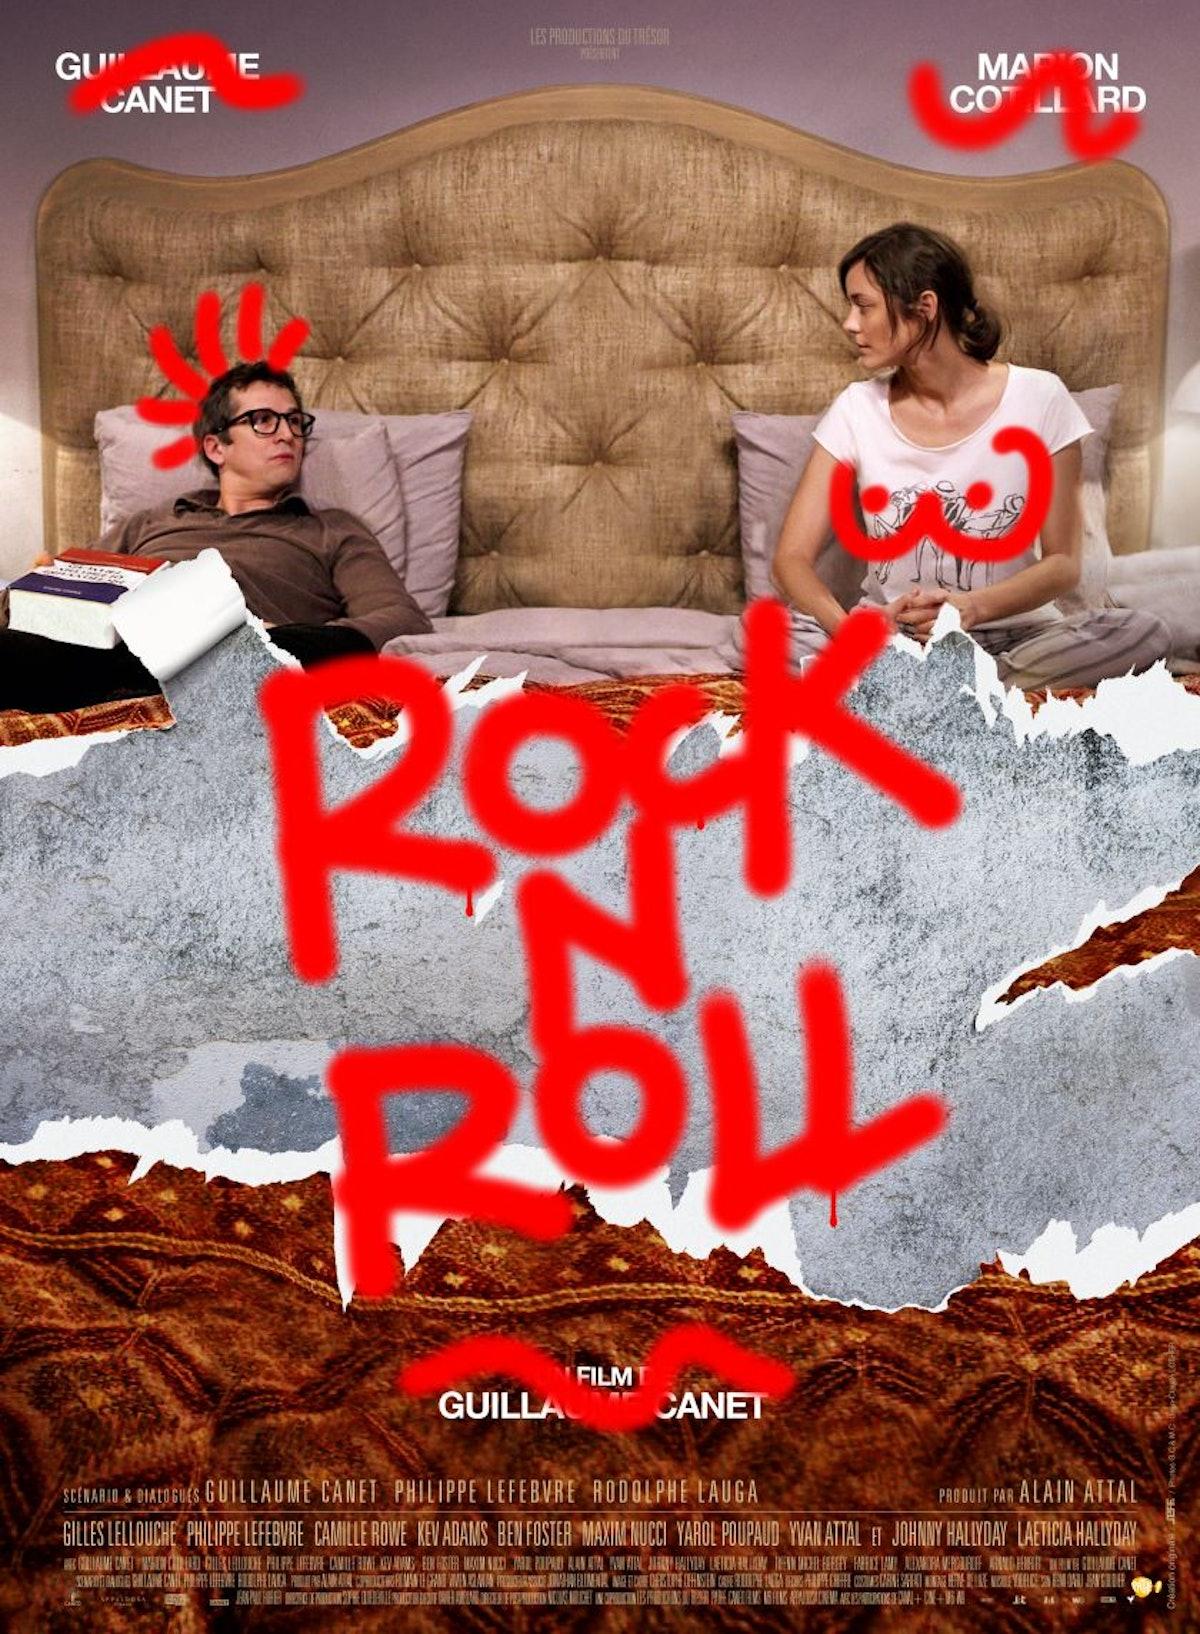 poster_rock-n-roll.jpg